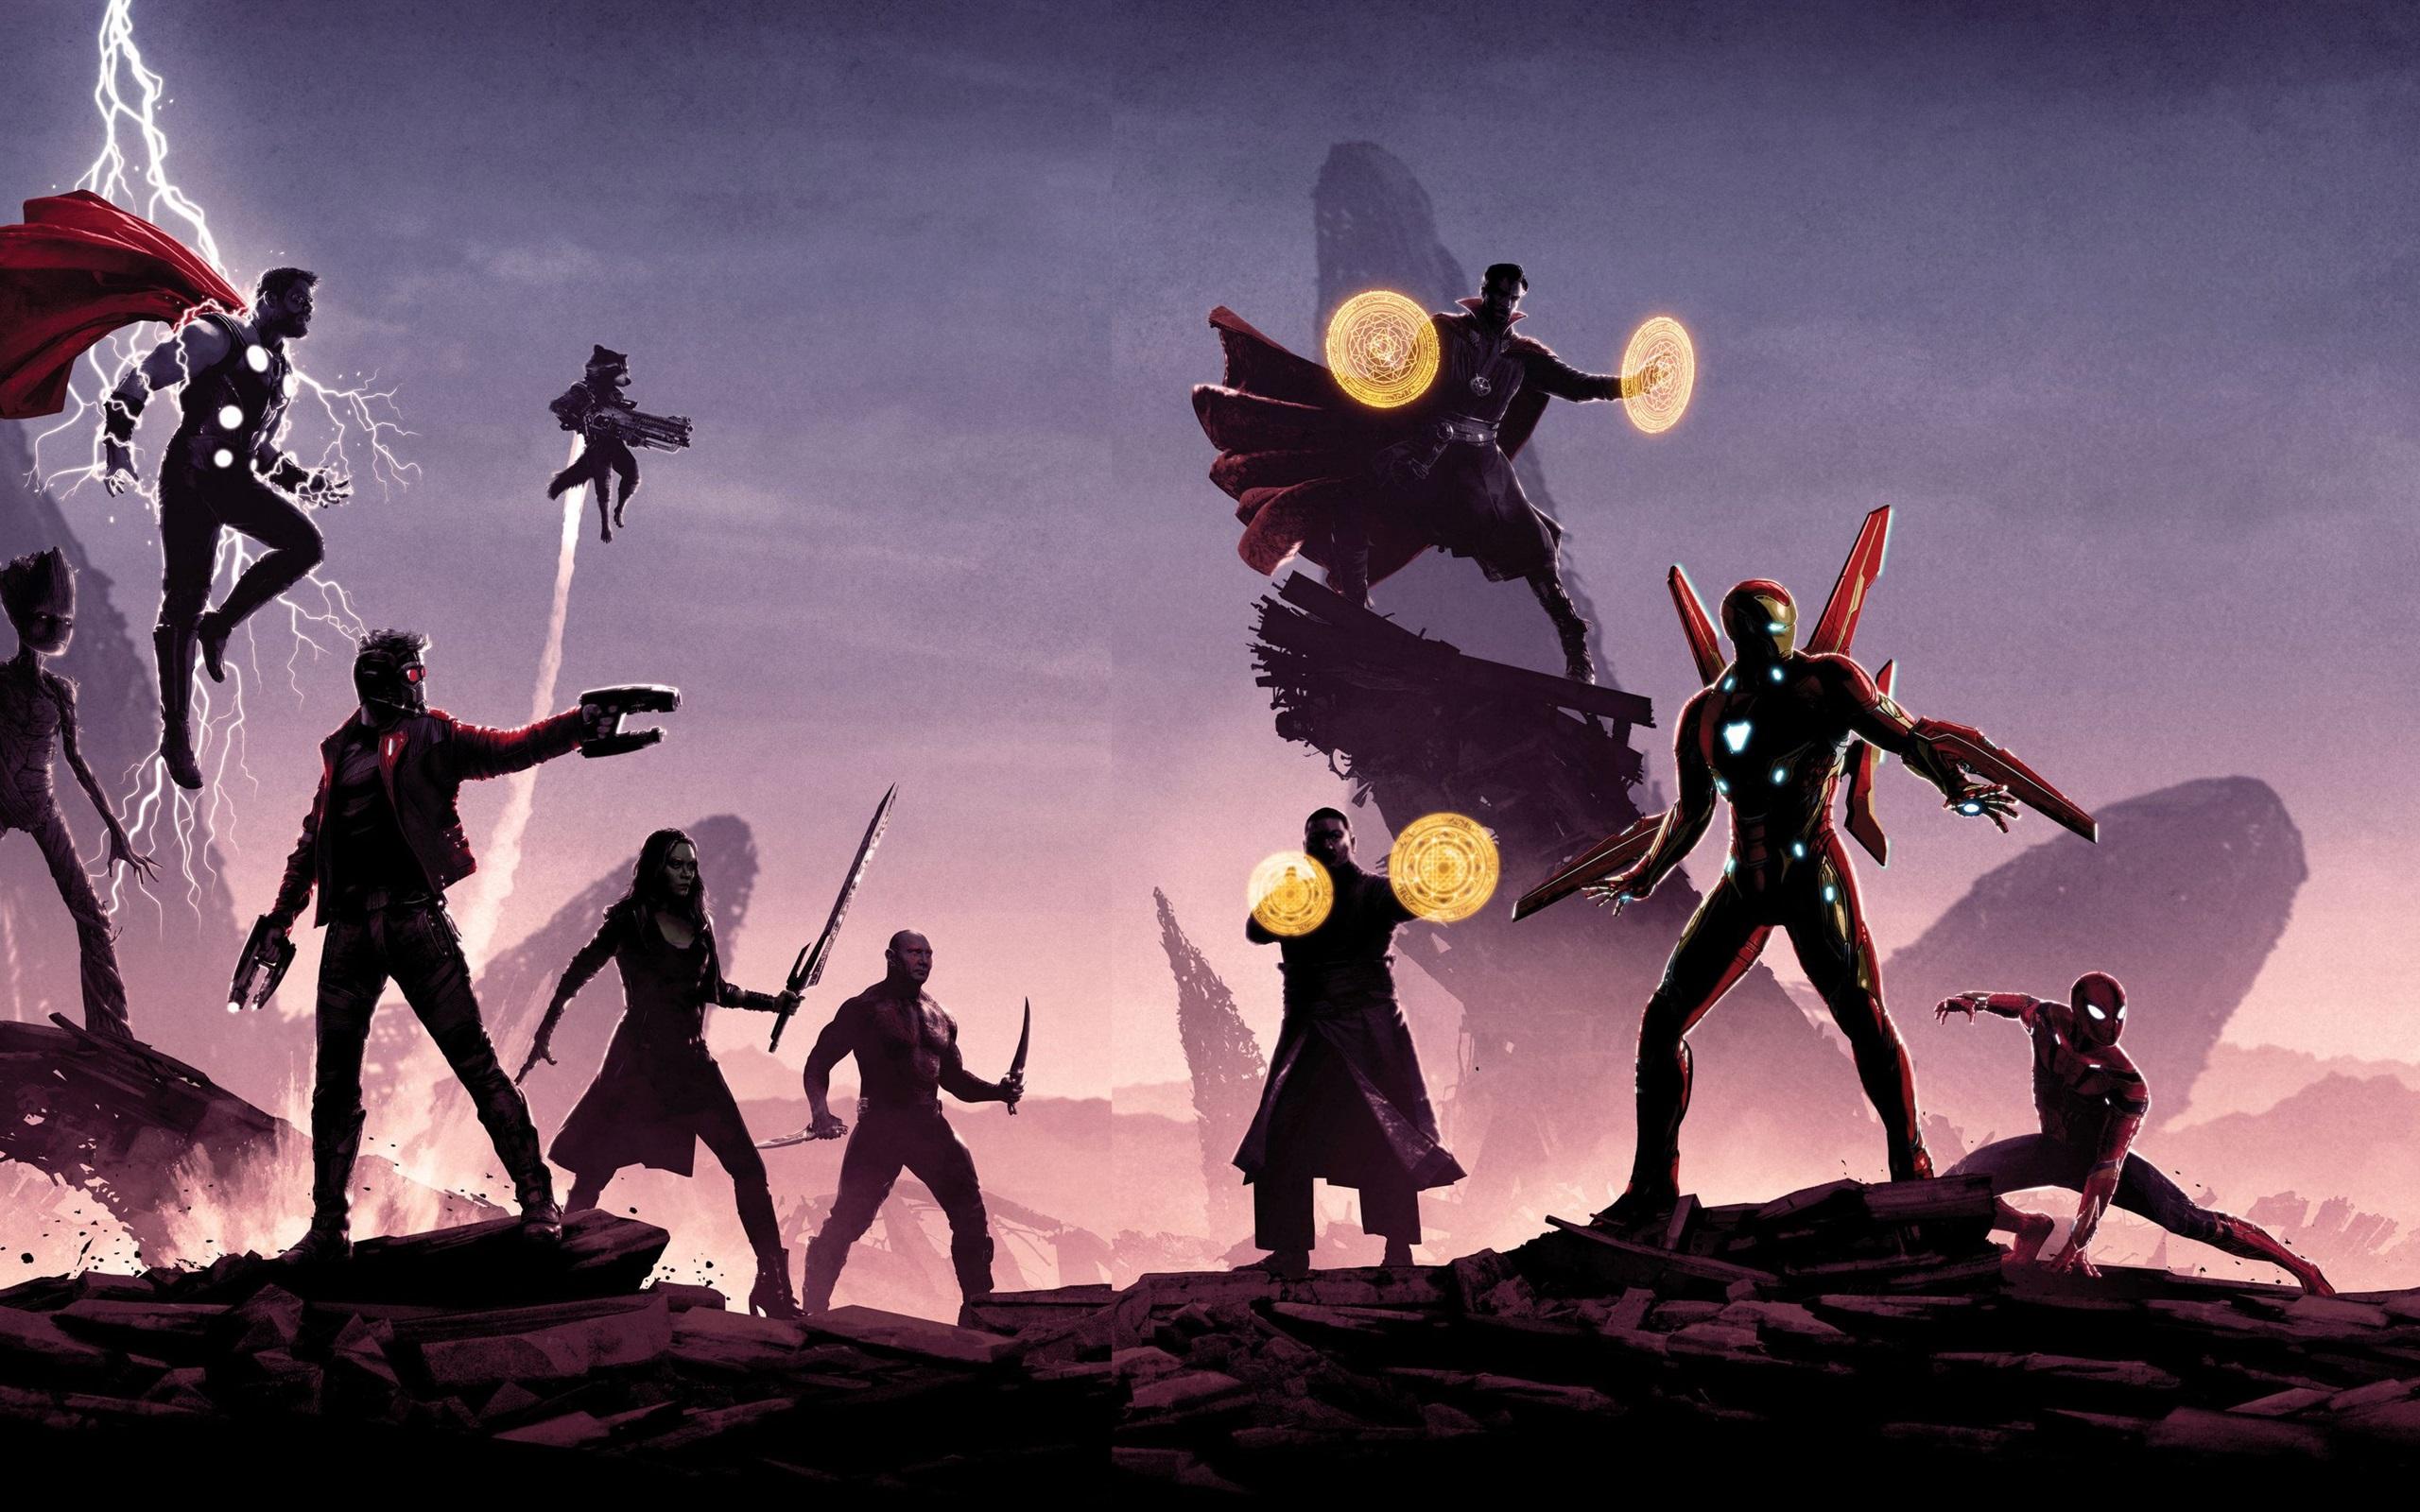 Wallpaper 2018 Movie Avengers Infinity War 2560x1600 Hd